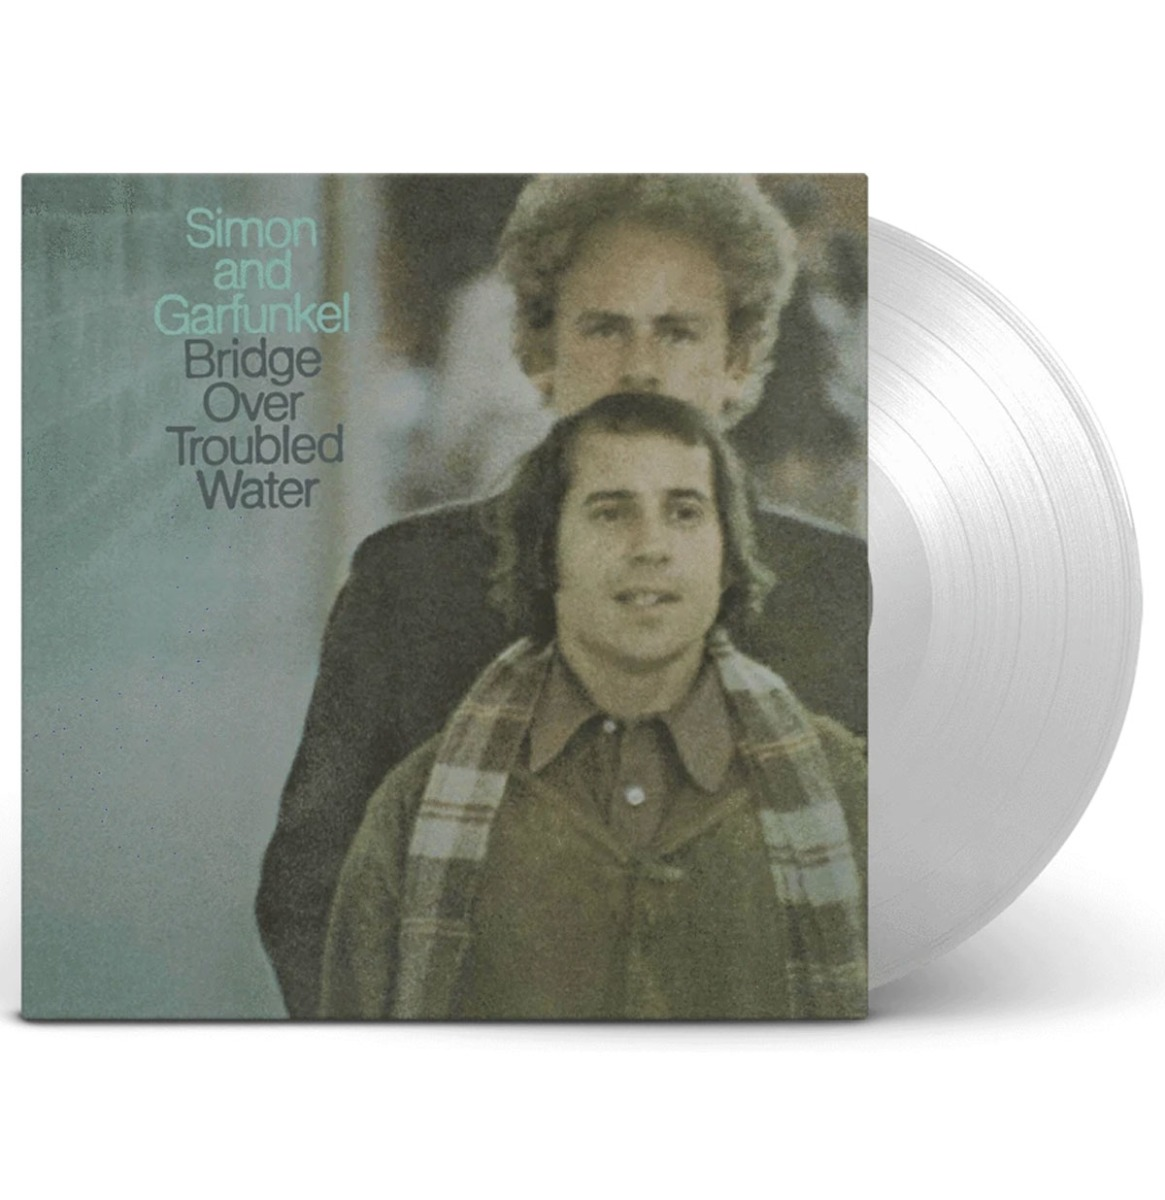 Simon And Garfunkel - Bridge Over Troubled Water LP (Limited Transparent Vinyl)